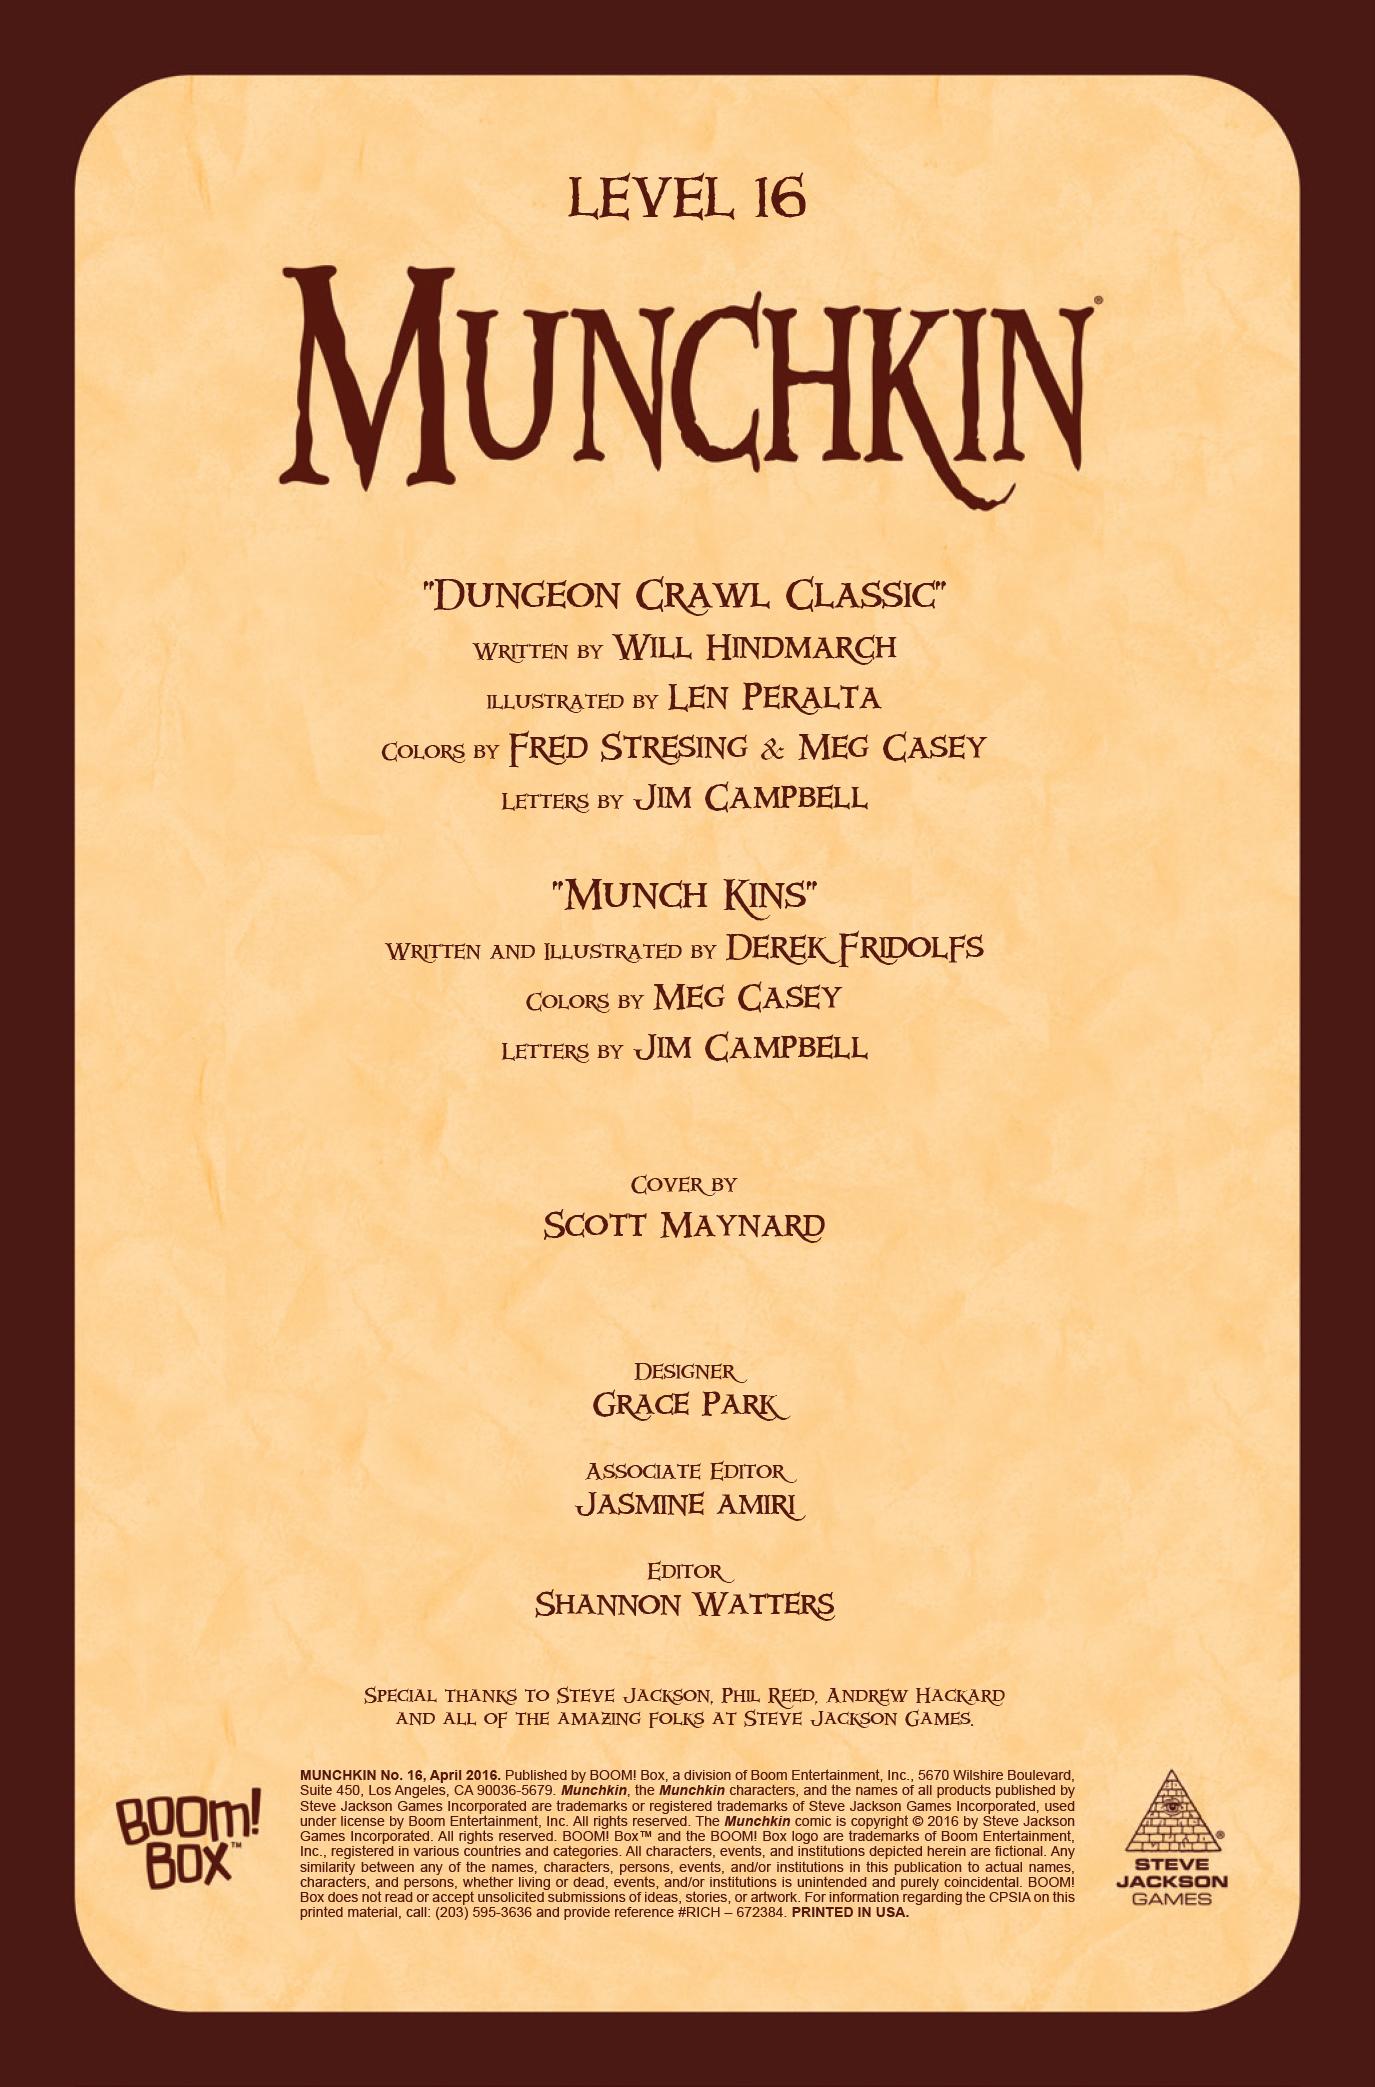 Munchkin_016_PRESS-2